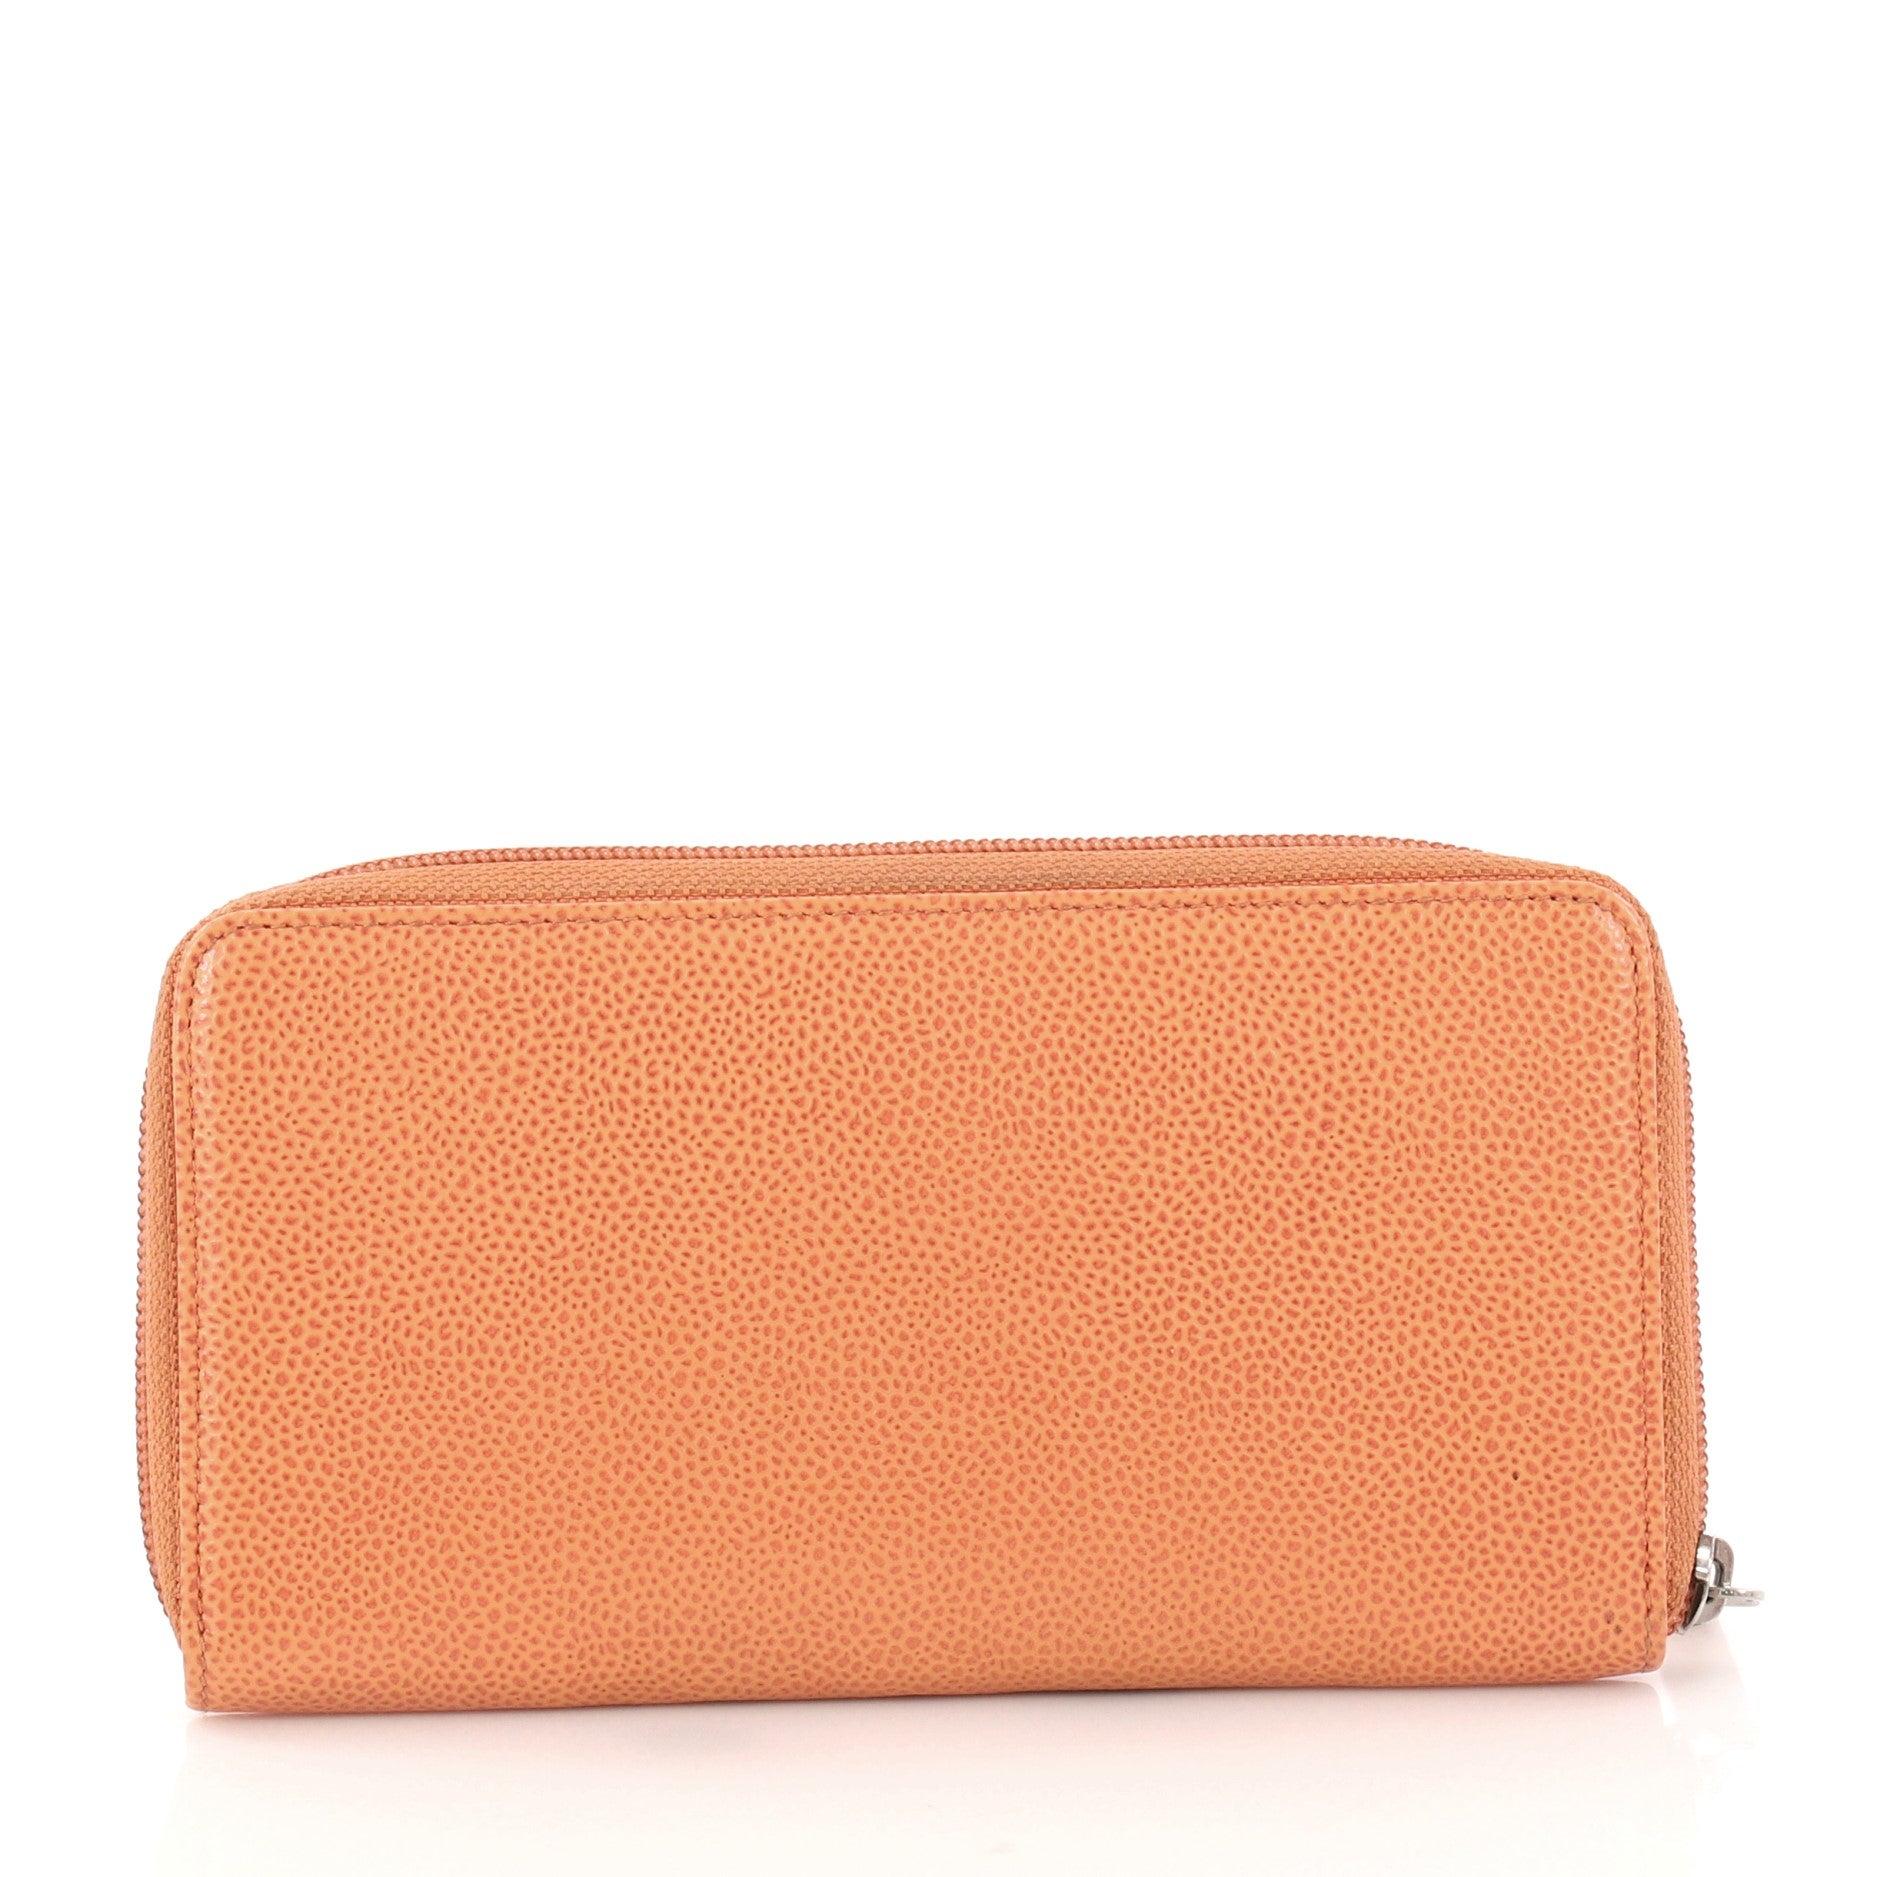 0501f3087886 Chanel Timeless CC Zipped Wallet Caviar Long at 1stdibs